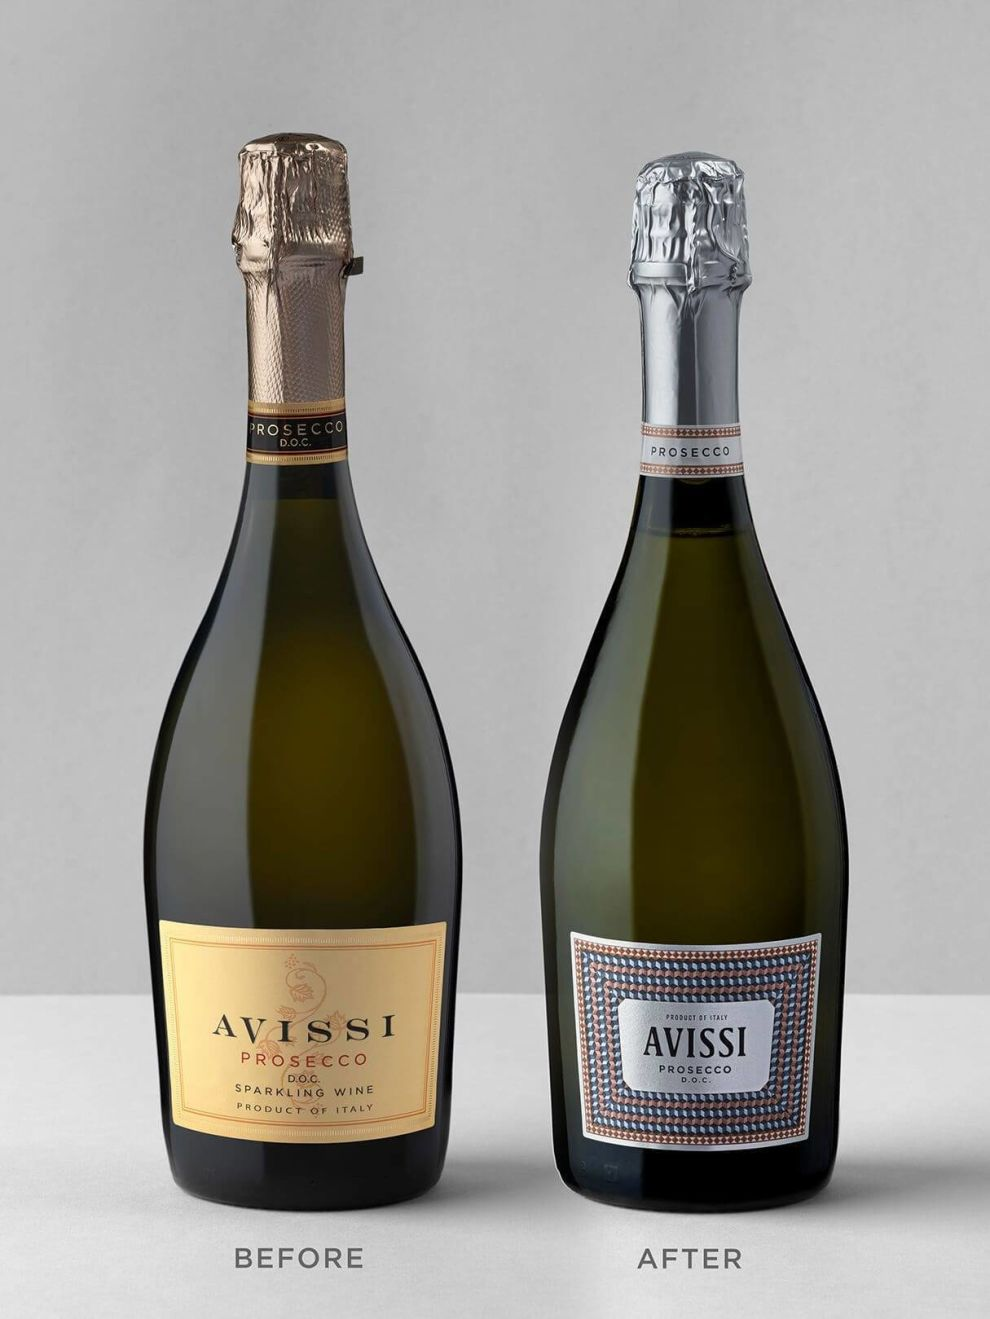 Avissi Prosecco wine label design